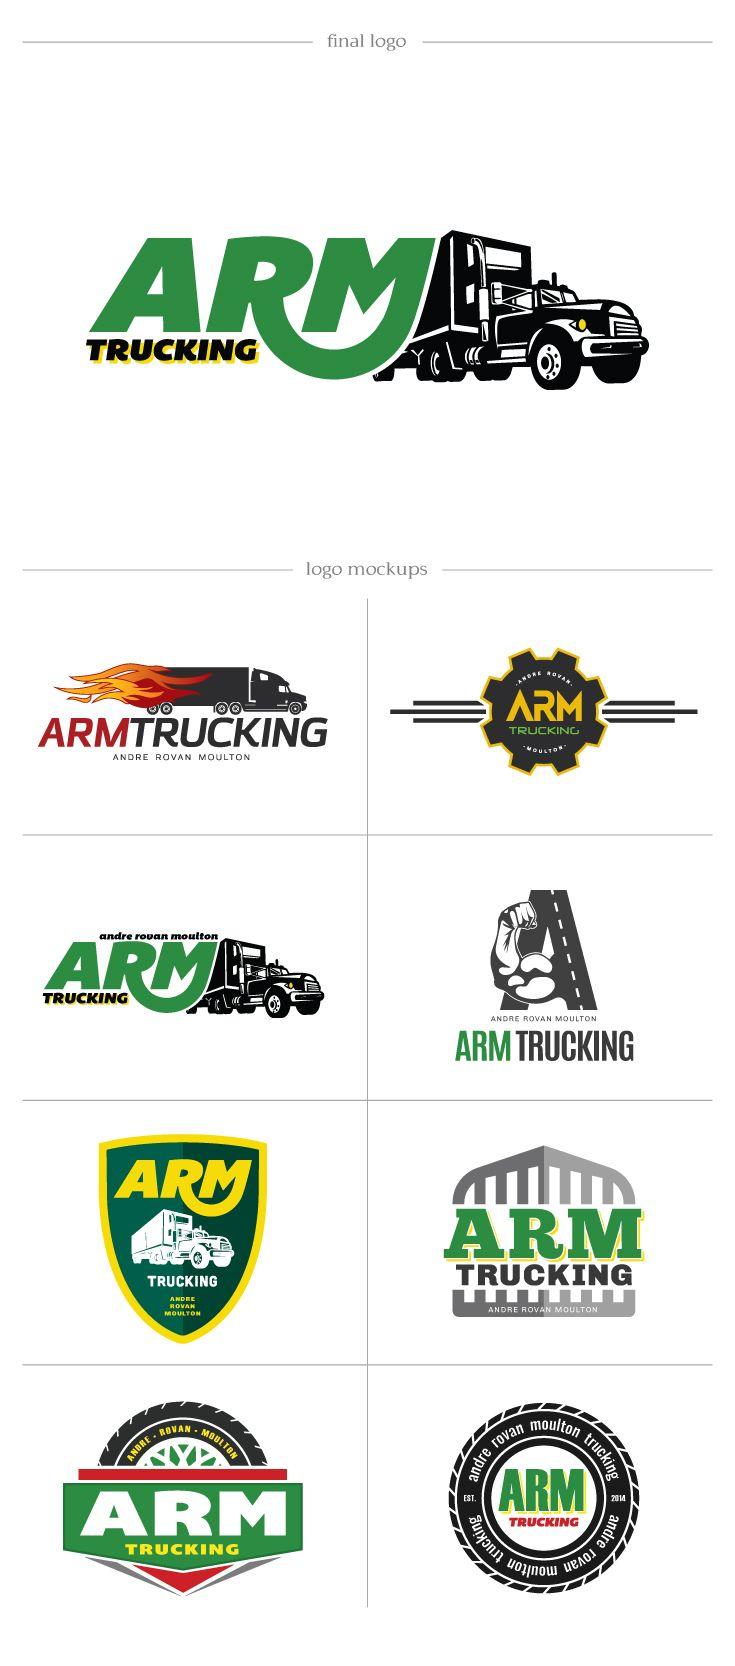 ARM Trucking - DesAutels Designs | logo development process